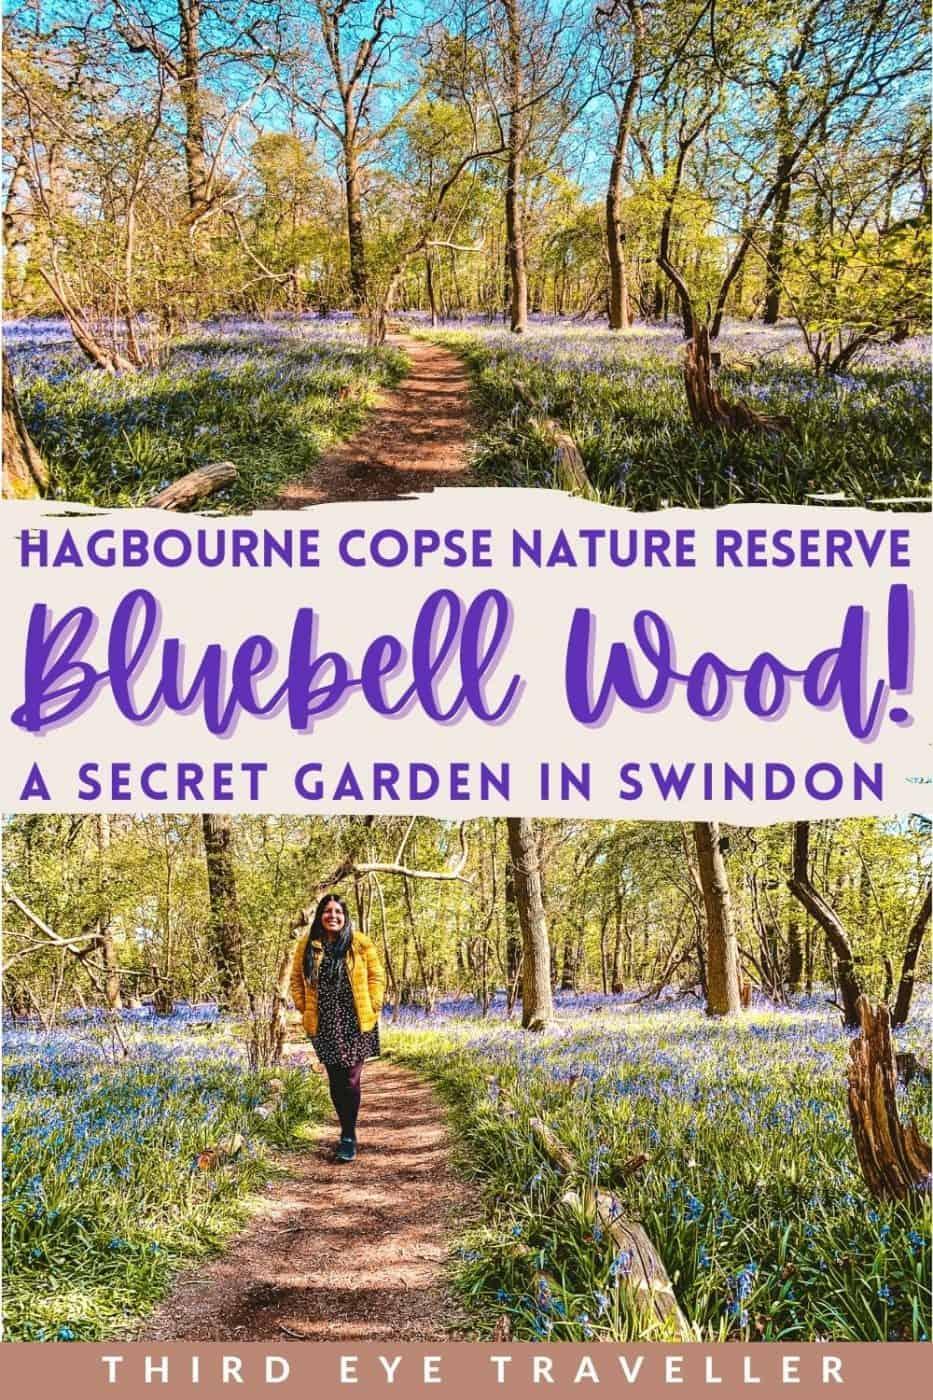 Hagbourne Copse Nature Reserve Bluebell Wood Swindon